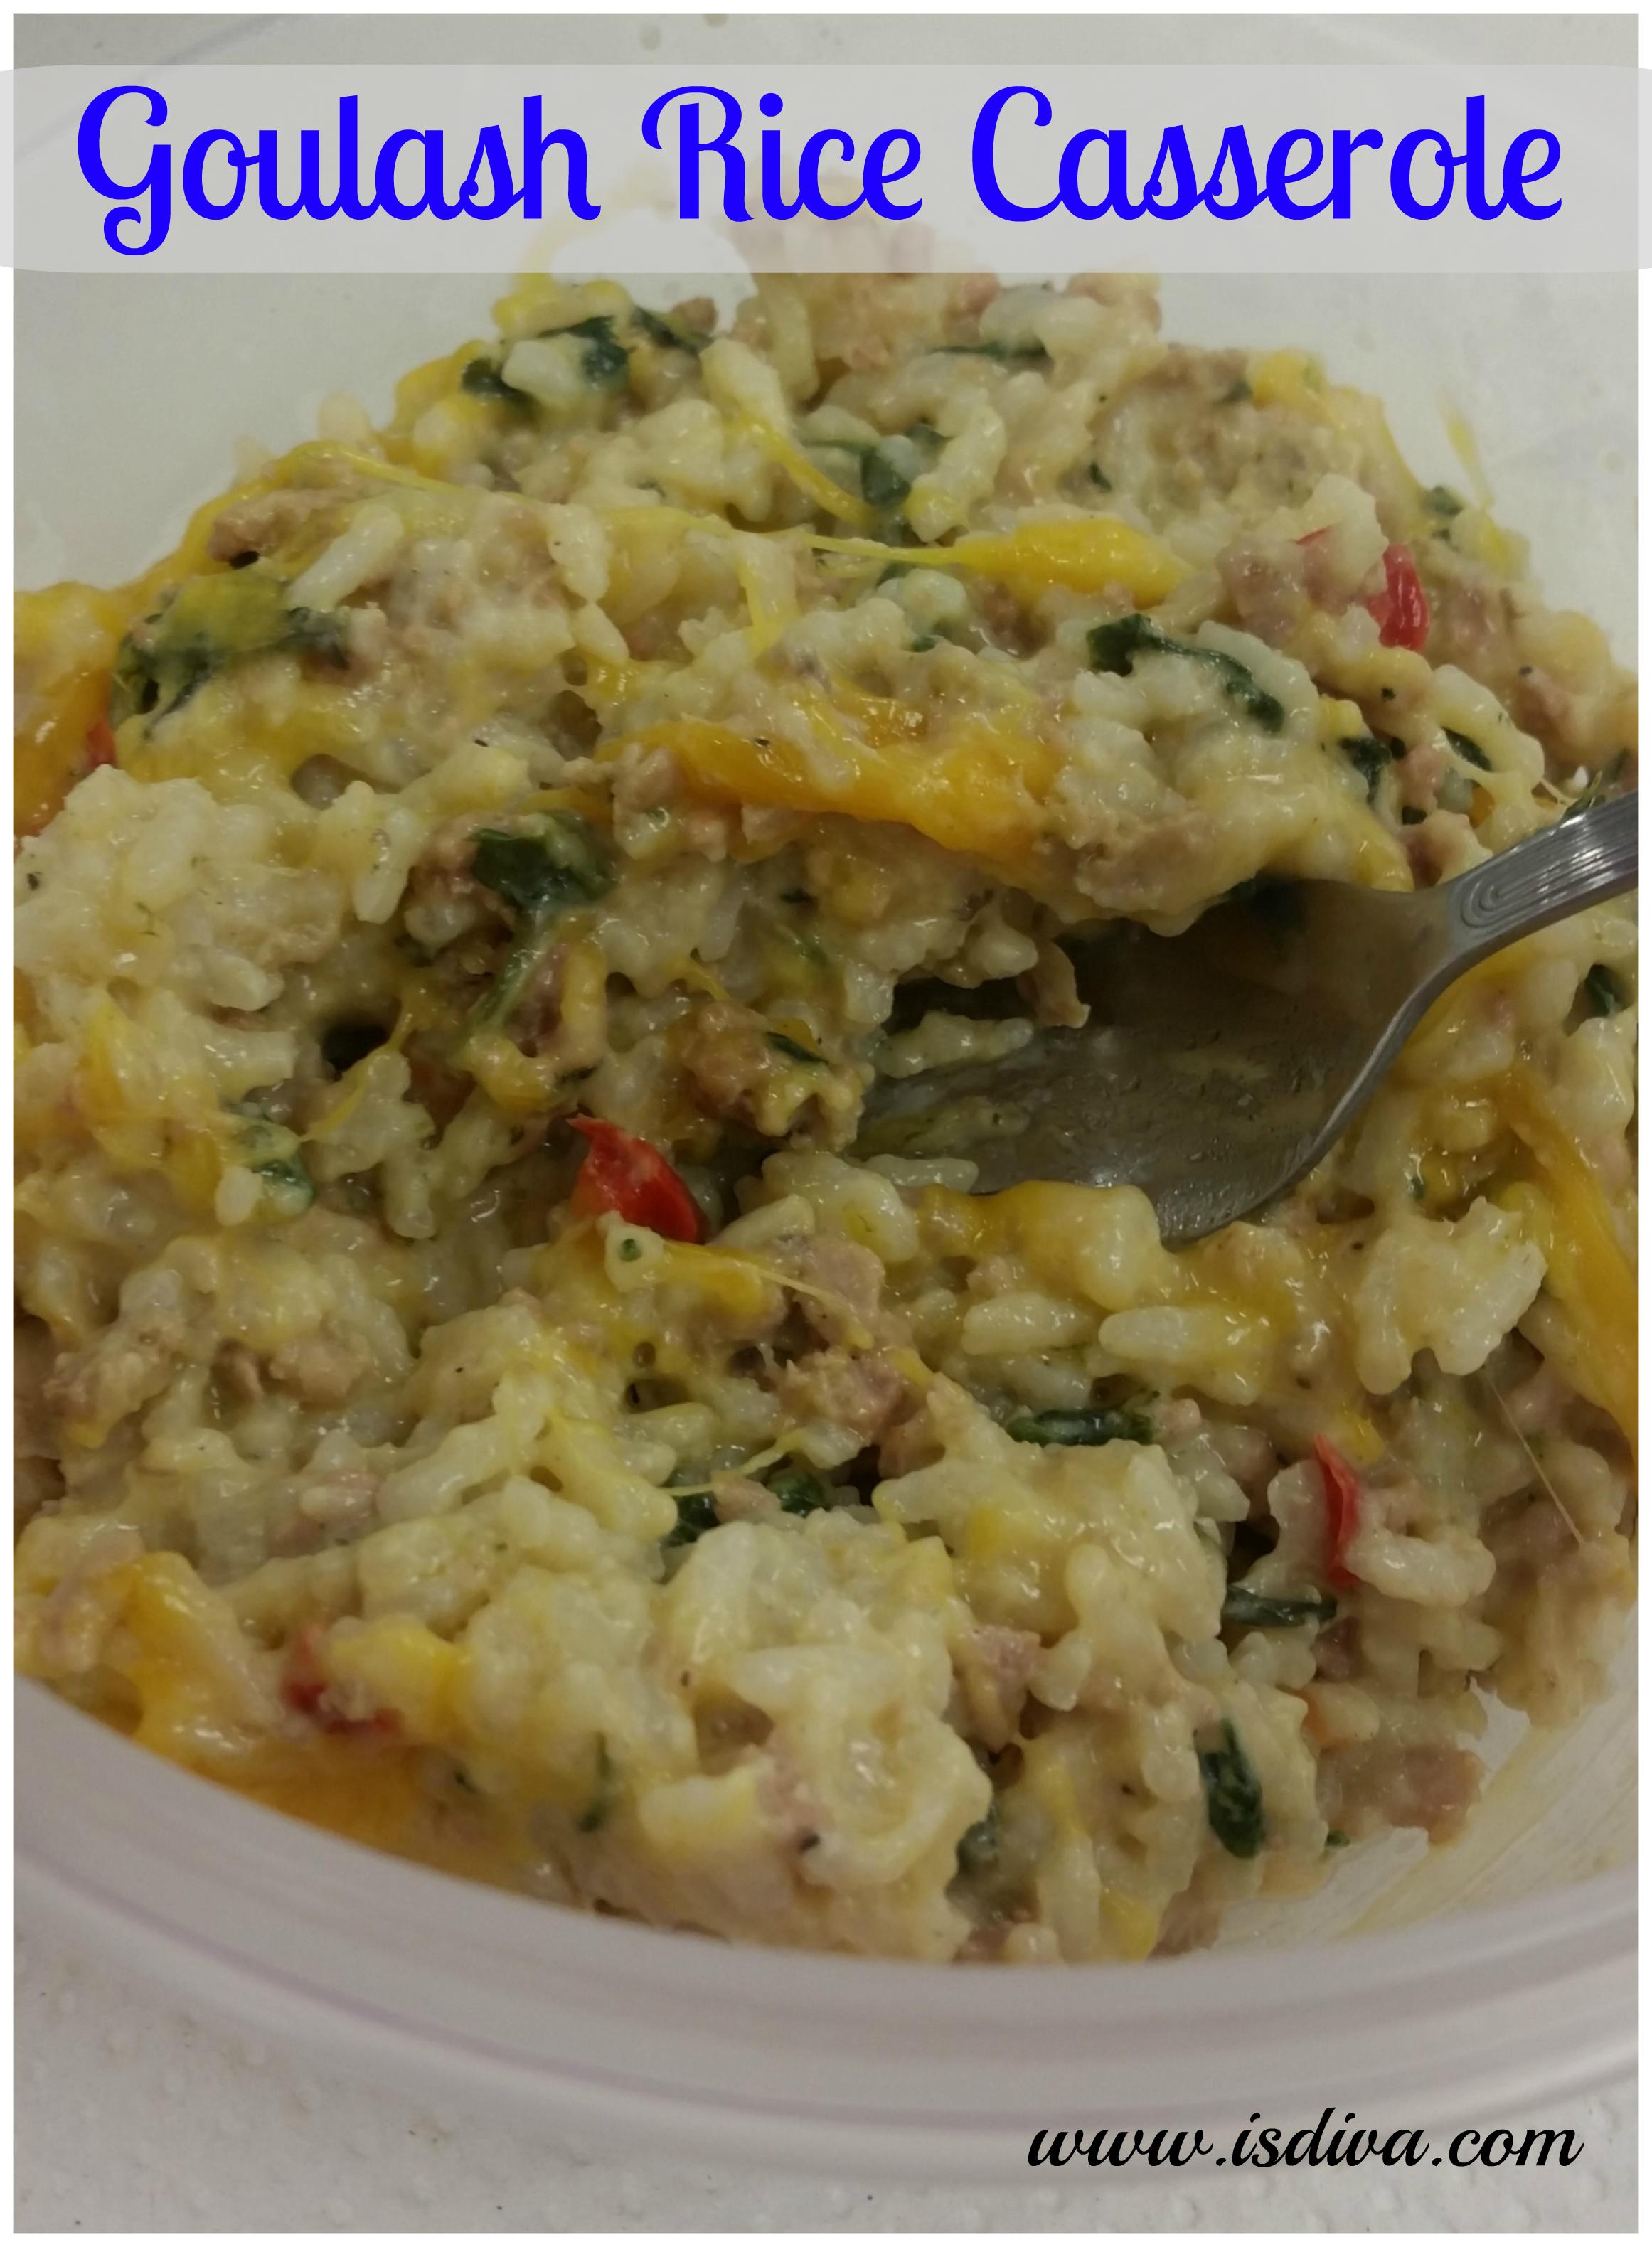 Goulash Rice Casserole